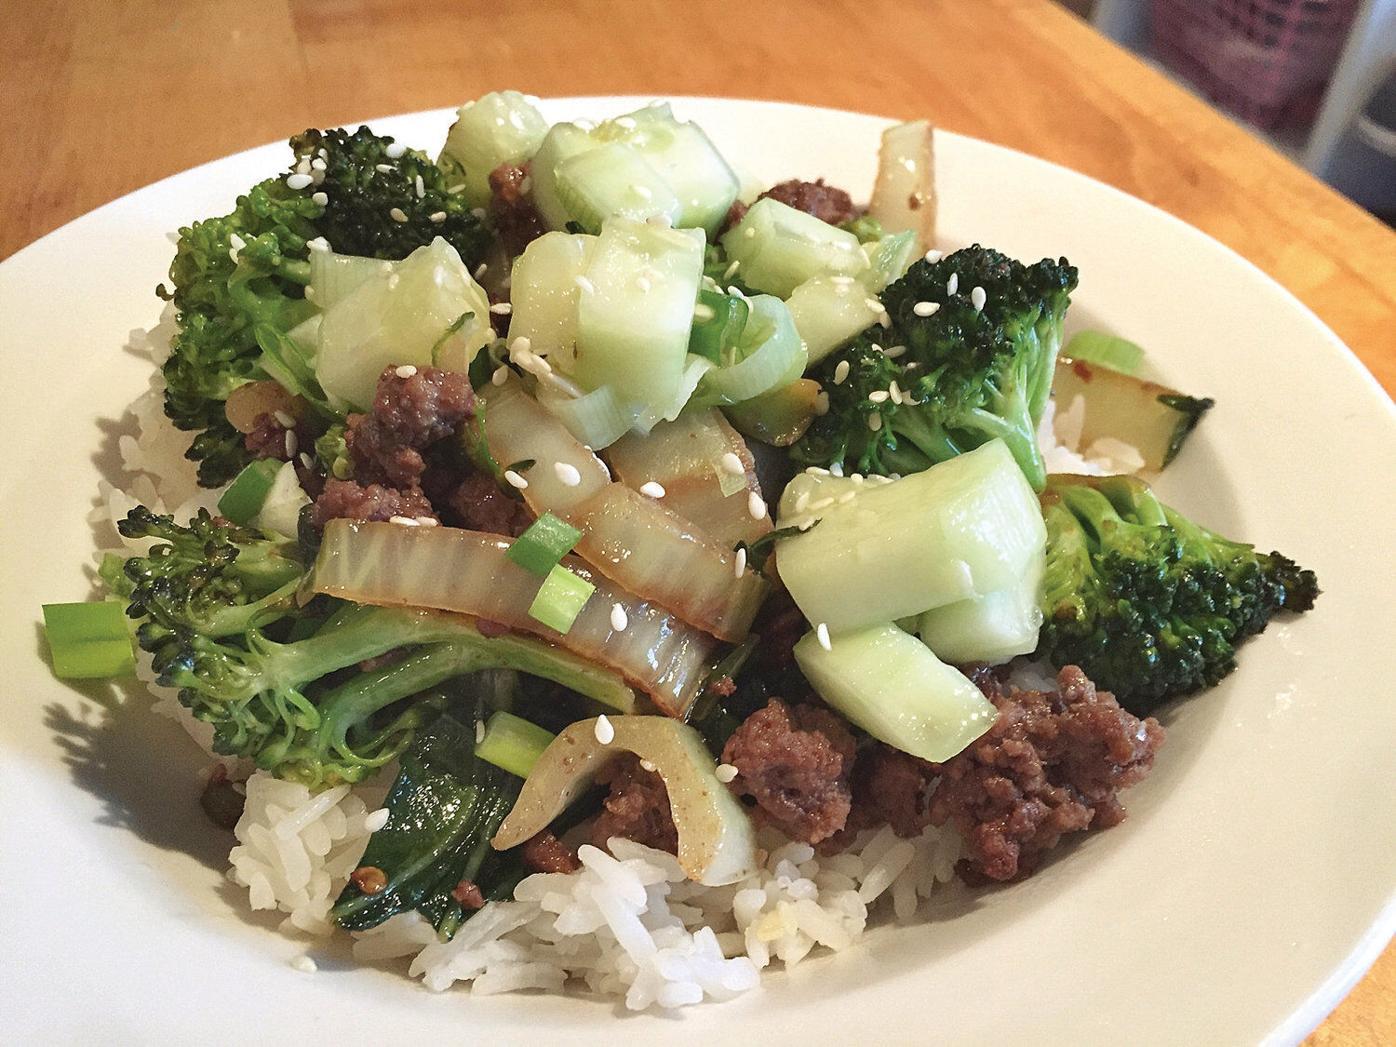 Easy weeknight dish: Very veggie stir fry